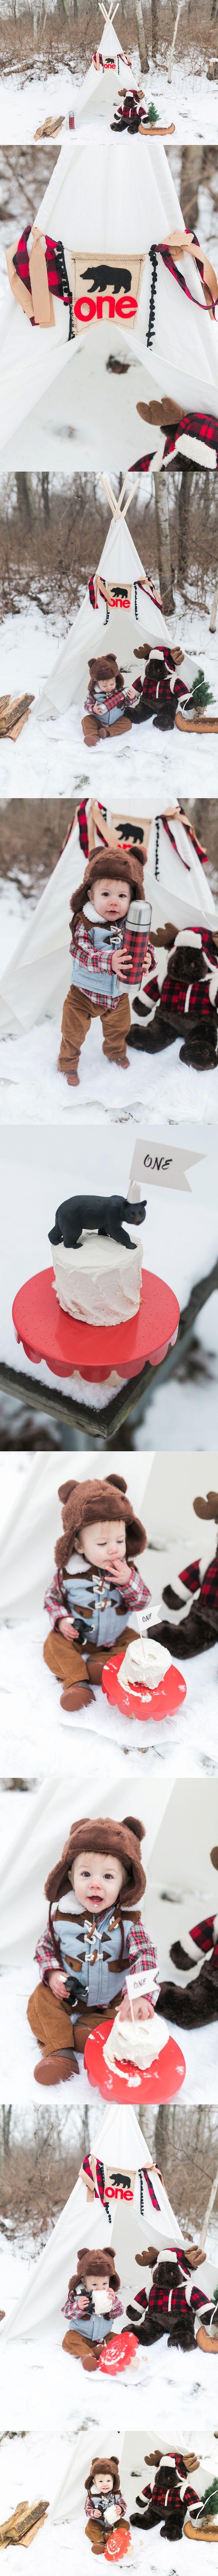 Camping first birthday photos/ Lumberjack first birthday photos/ first birthday cake smash/ winter birthday theme